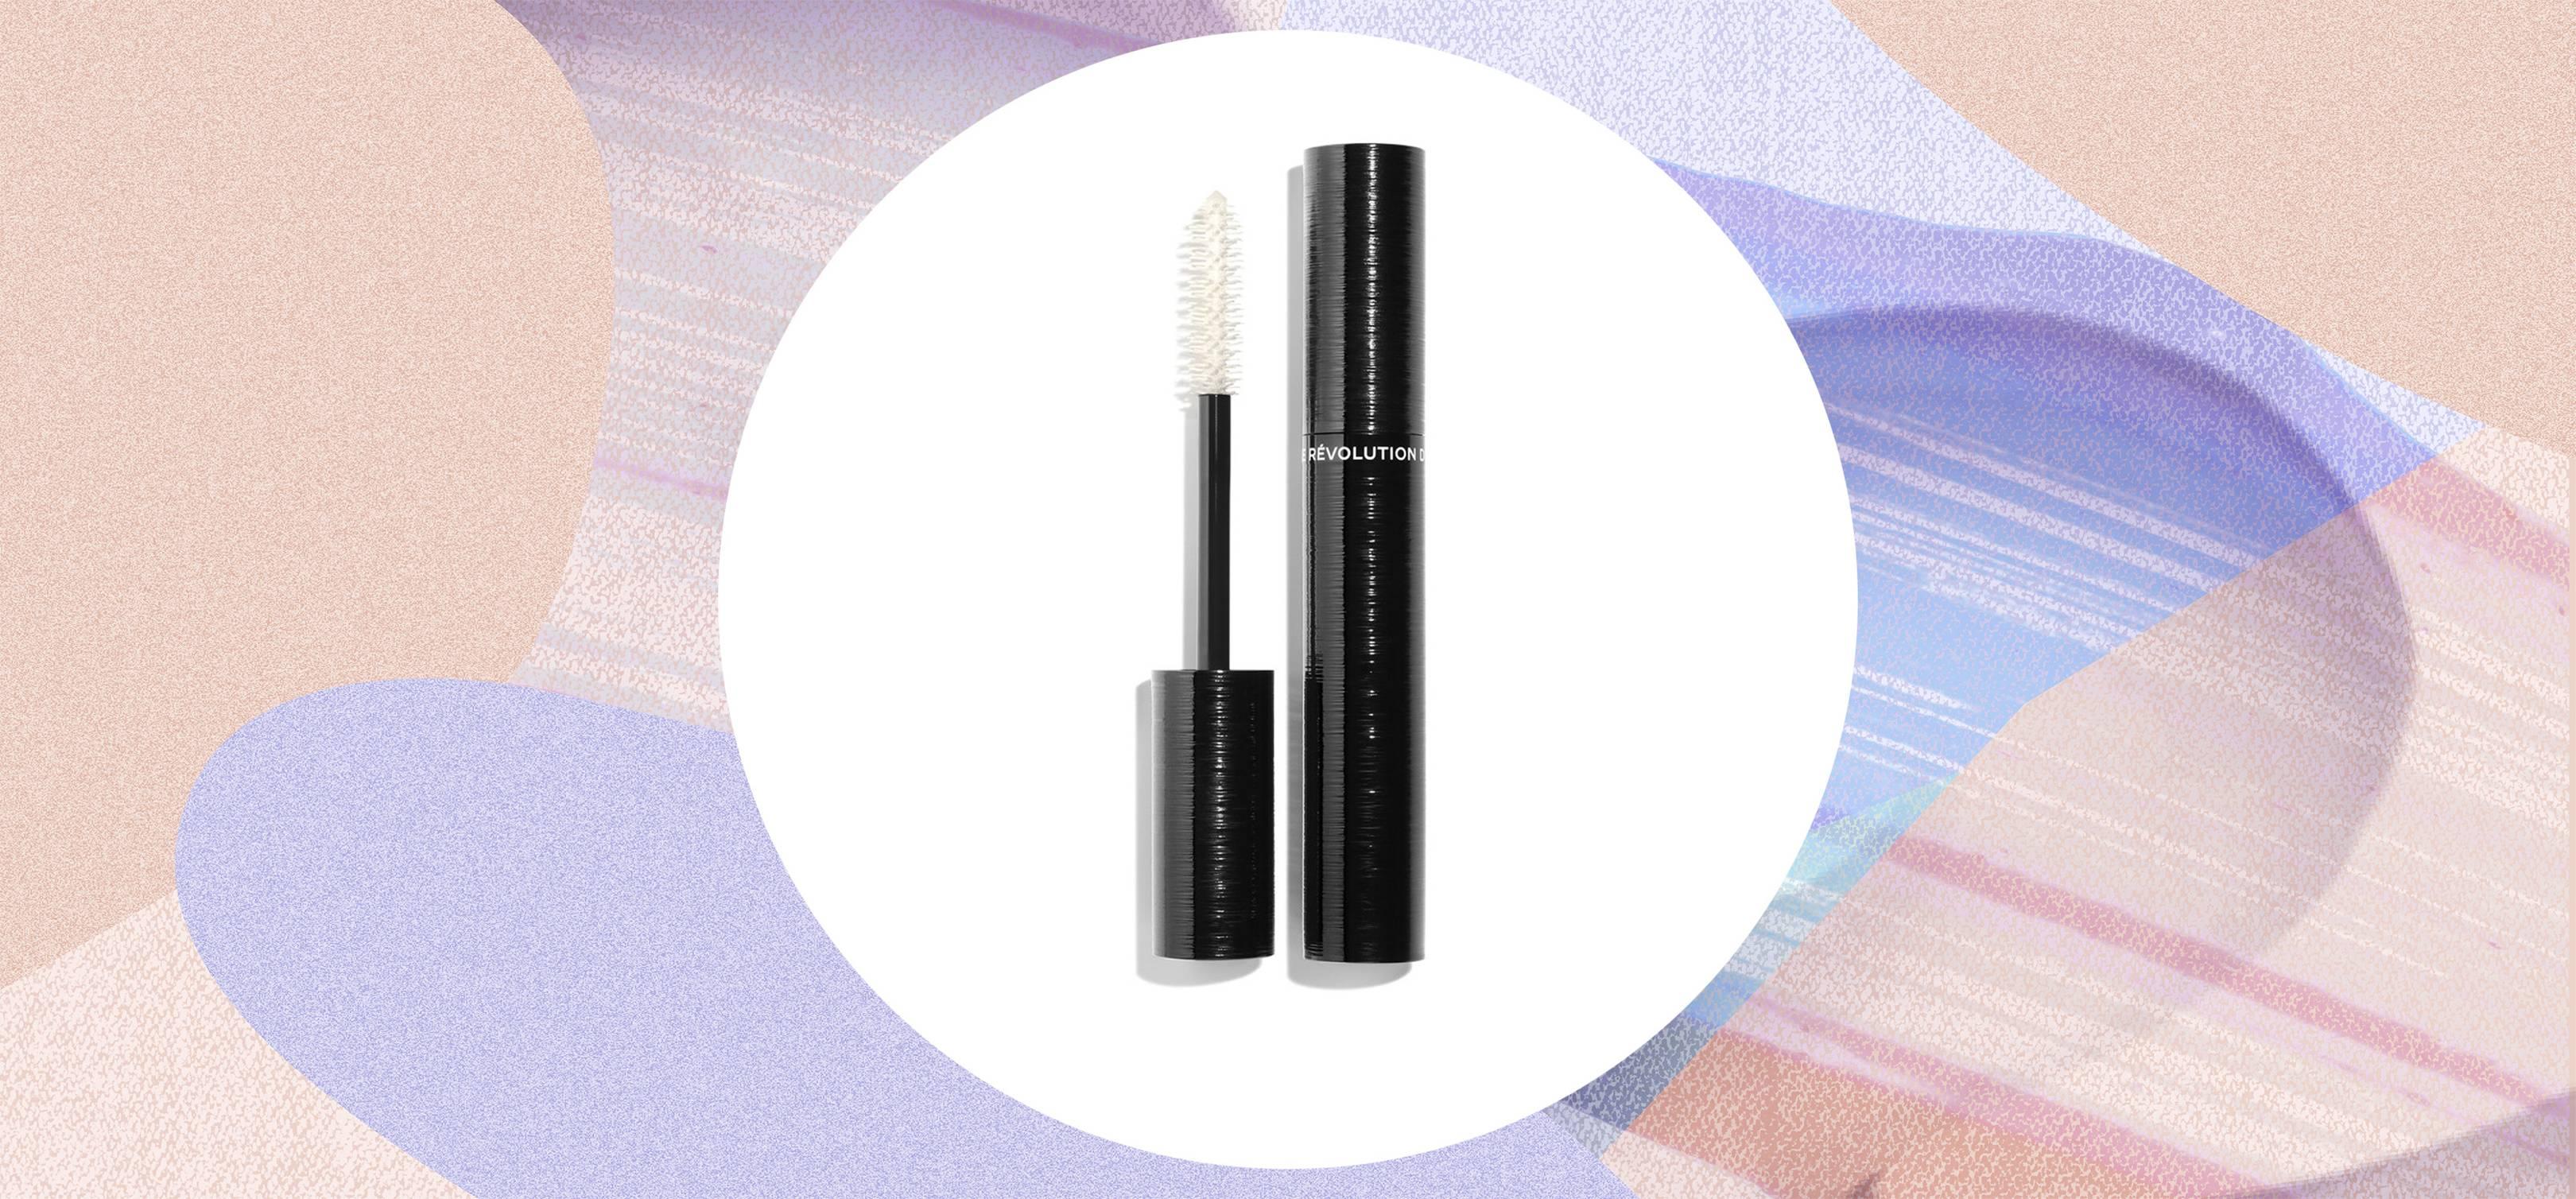 04e680ee7bb Chanel Le Volume Revolution Mascara 3D Review | Glamour UK